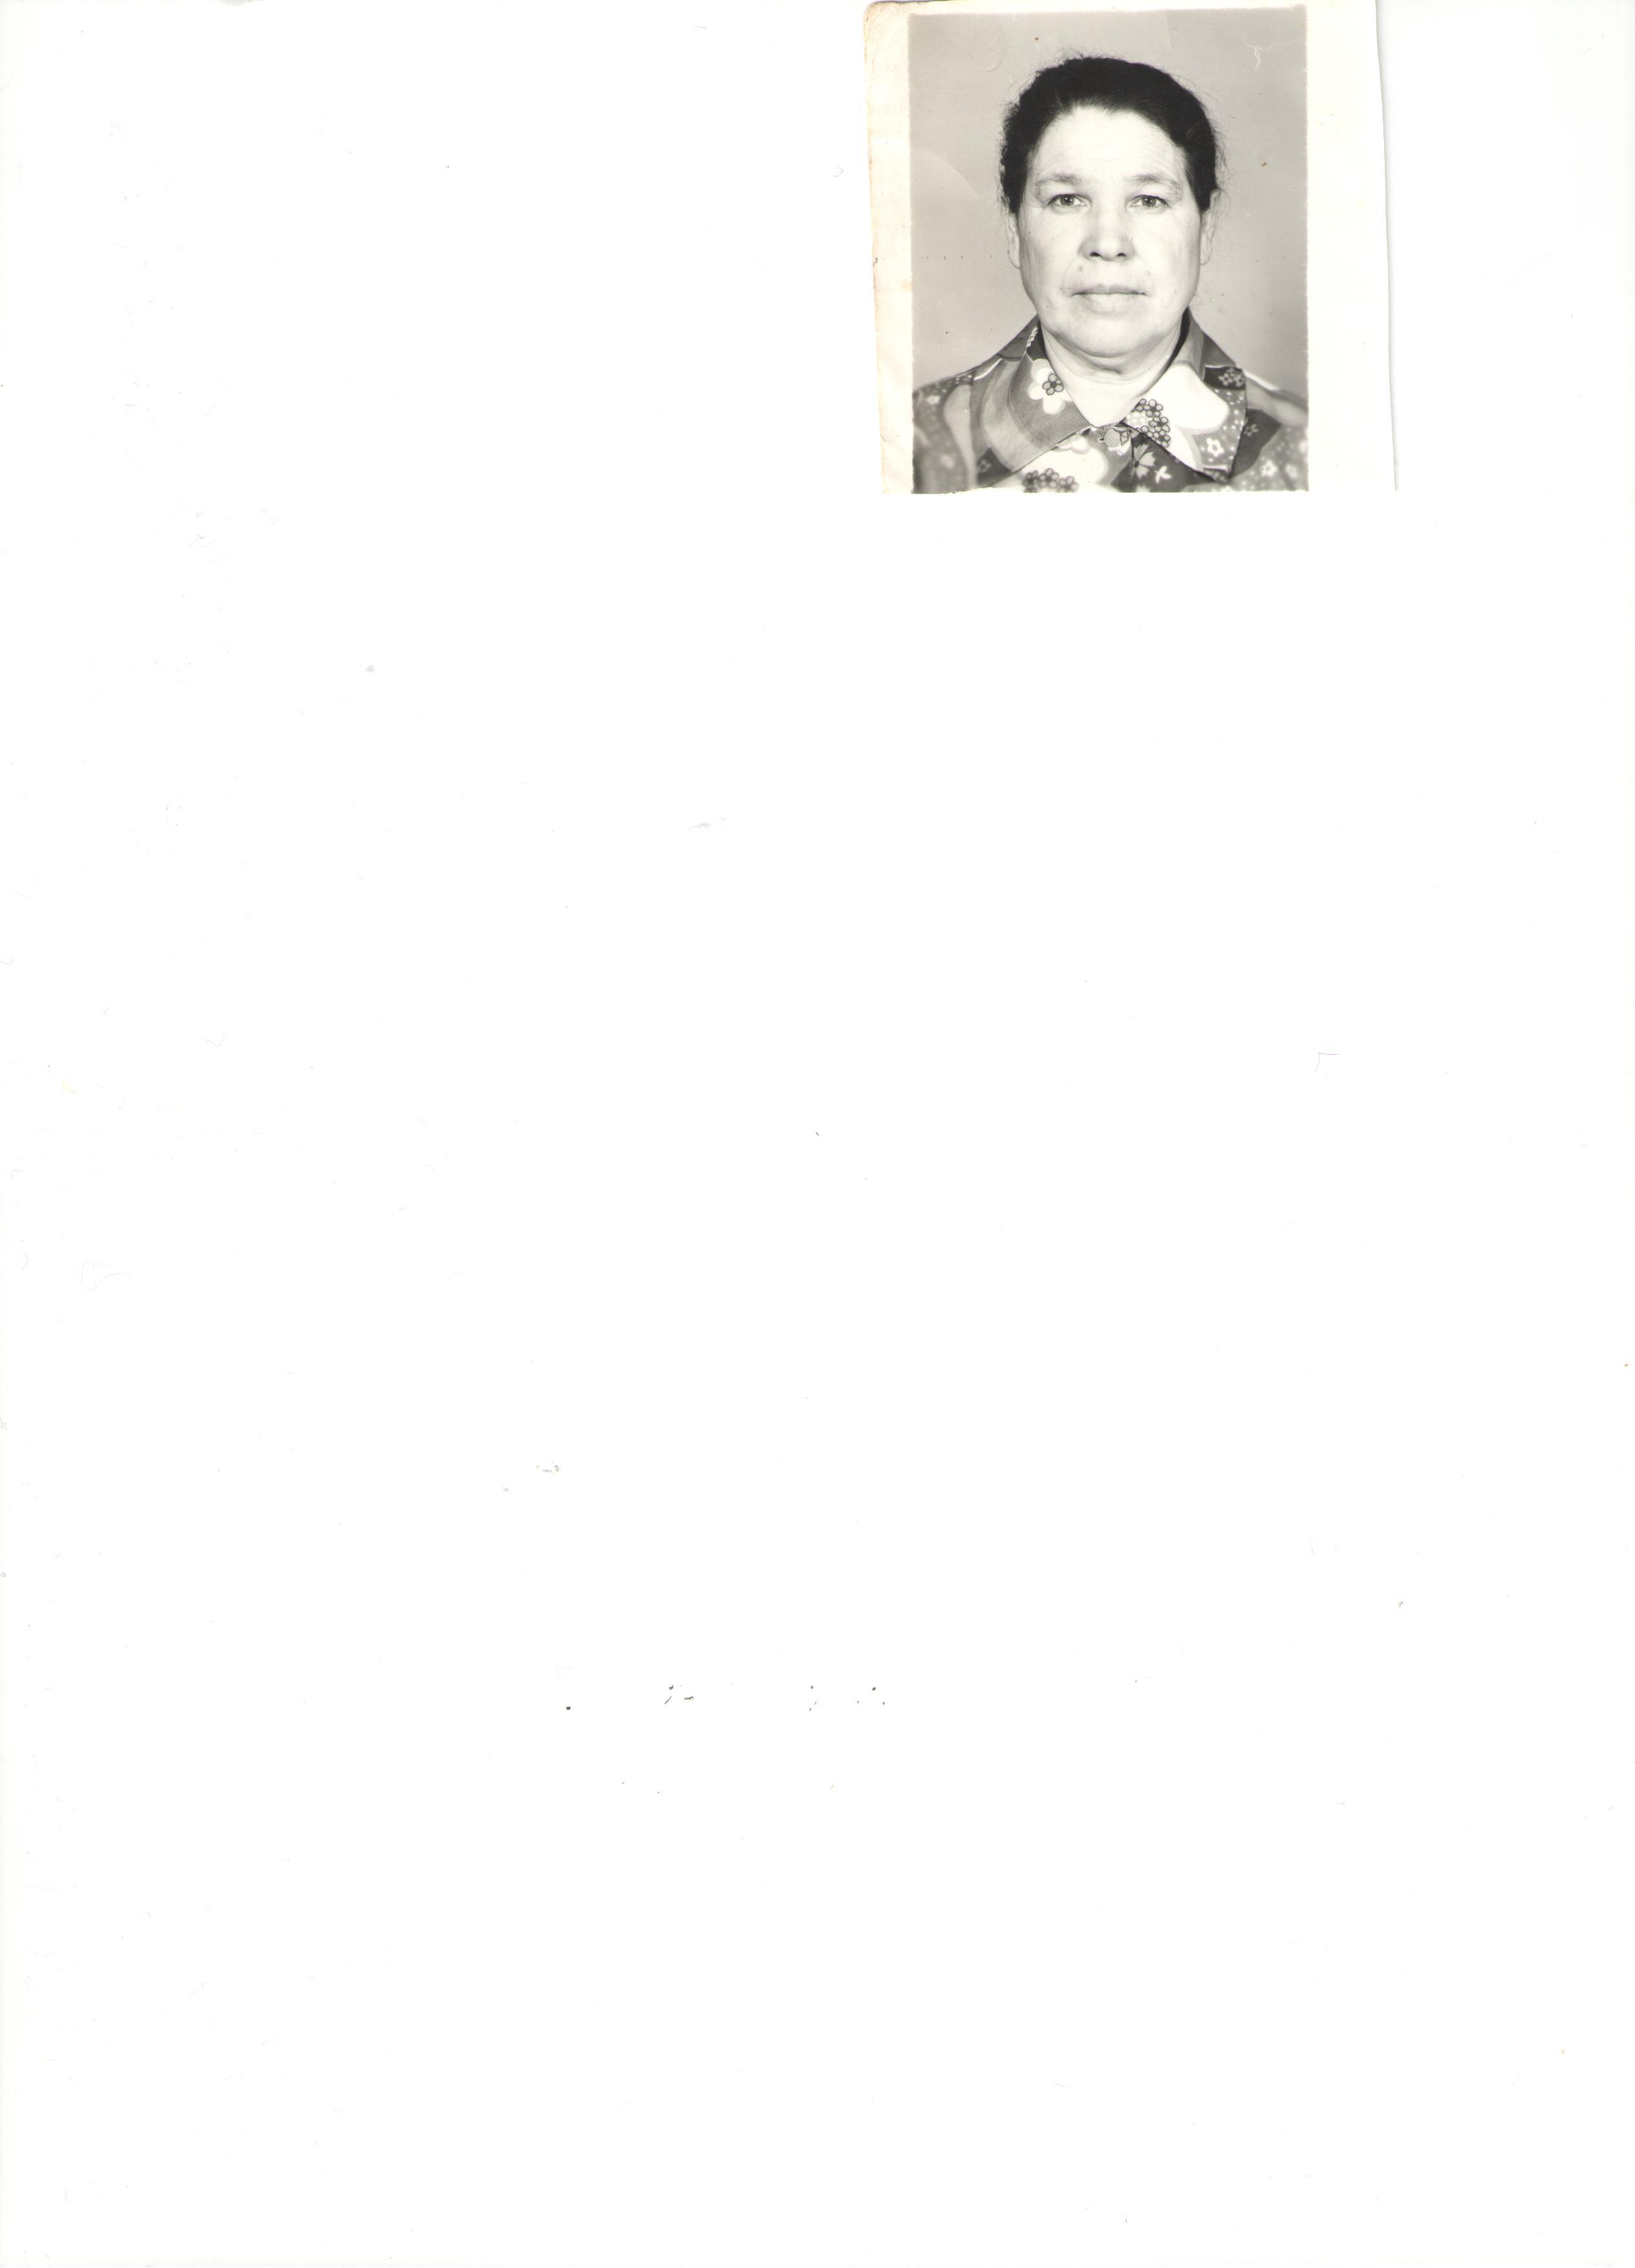 C:\Users\1978\Documents\Scanned Documents\Рисунок (15).jpg